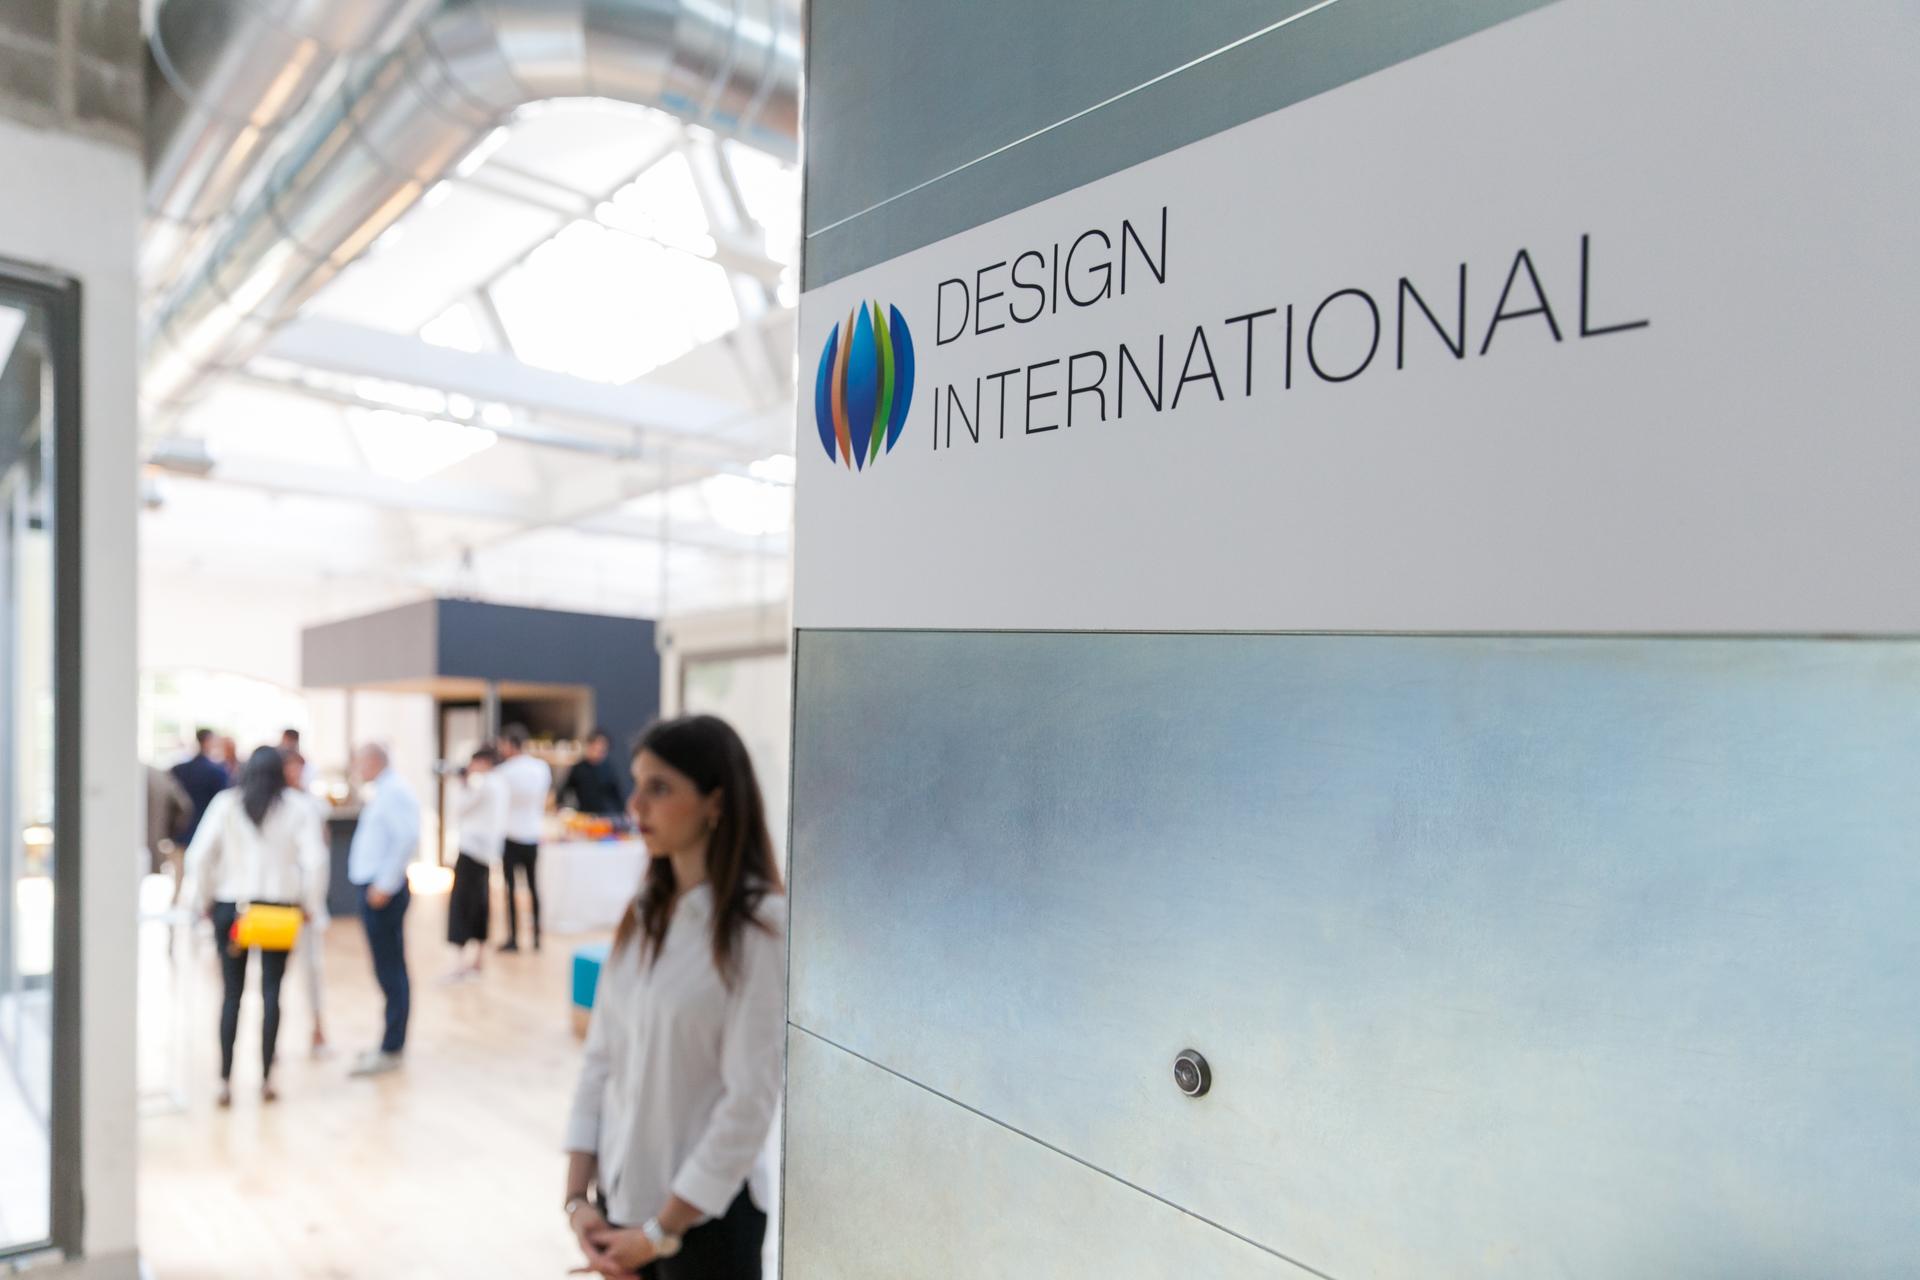 Design International e open